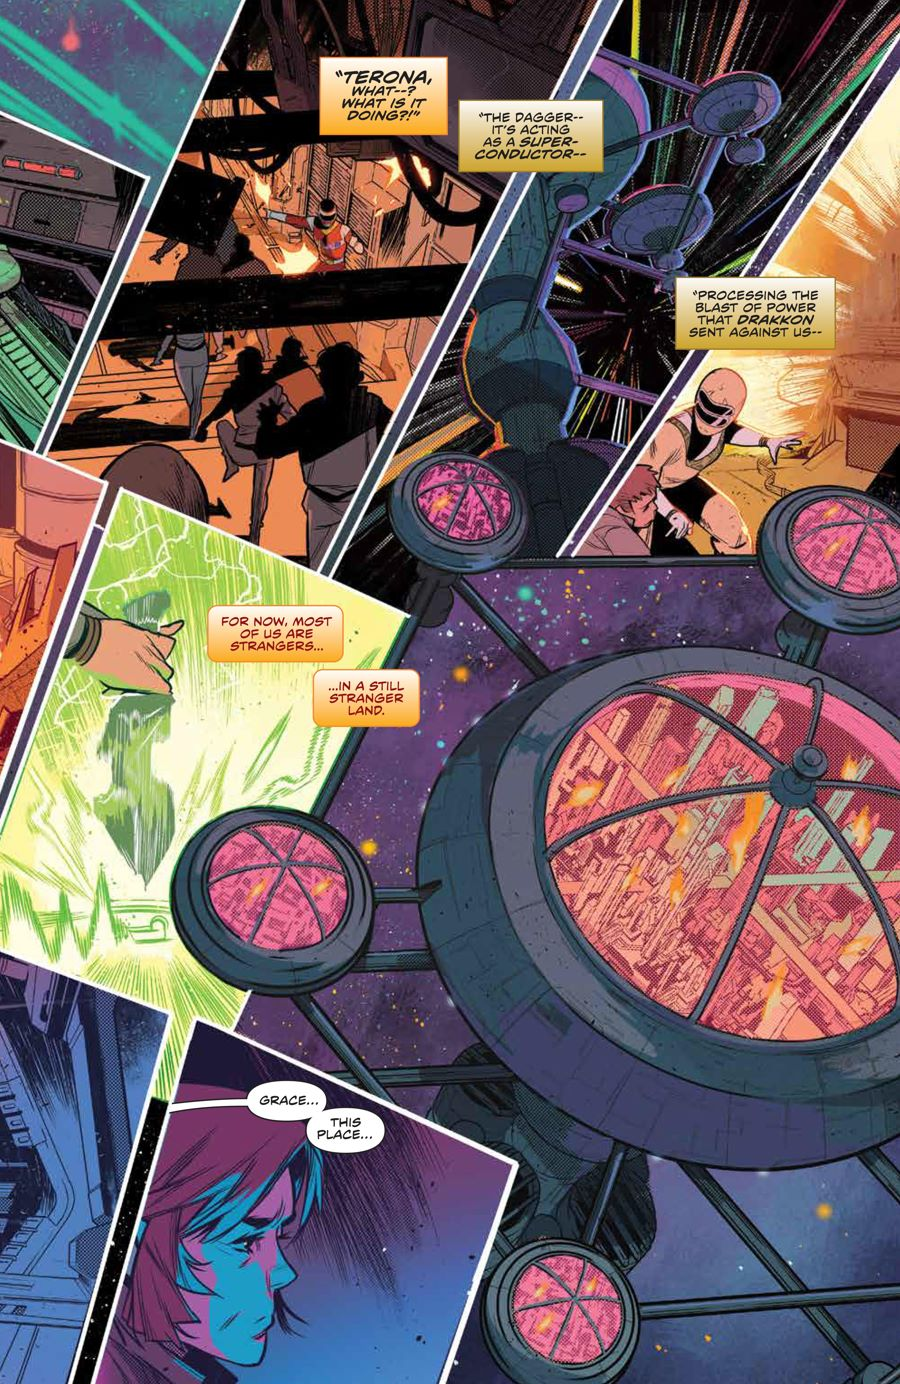 MMPR_BeyondGrid_SC_PRESS_11 ComicList Previews: MIGHTY MORPHIN POWER RANGERS BEYOND THE GRID TP